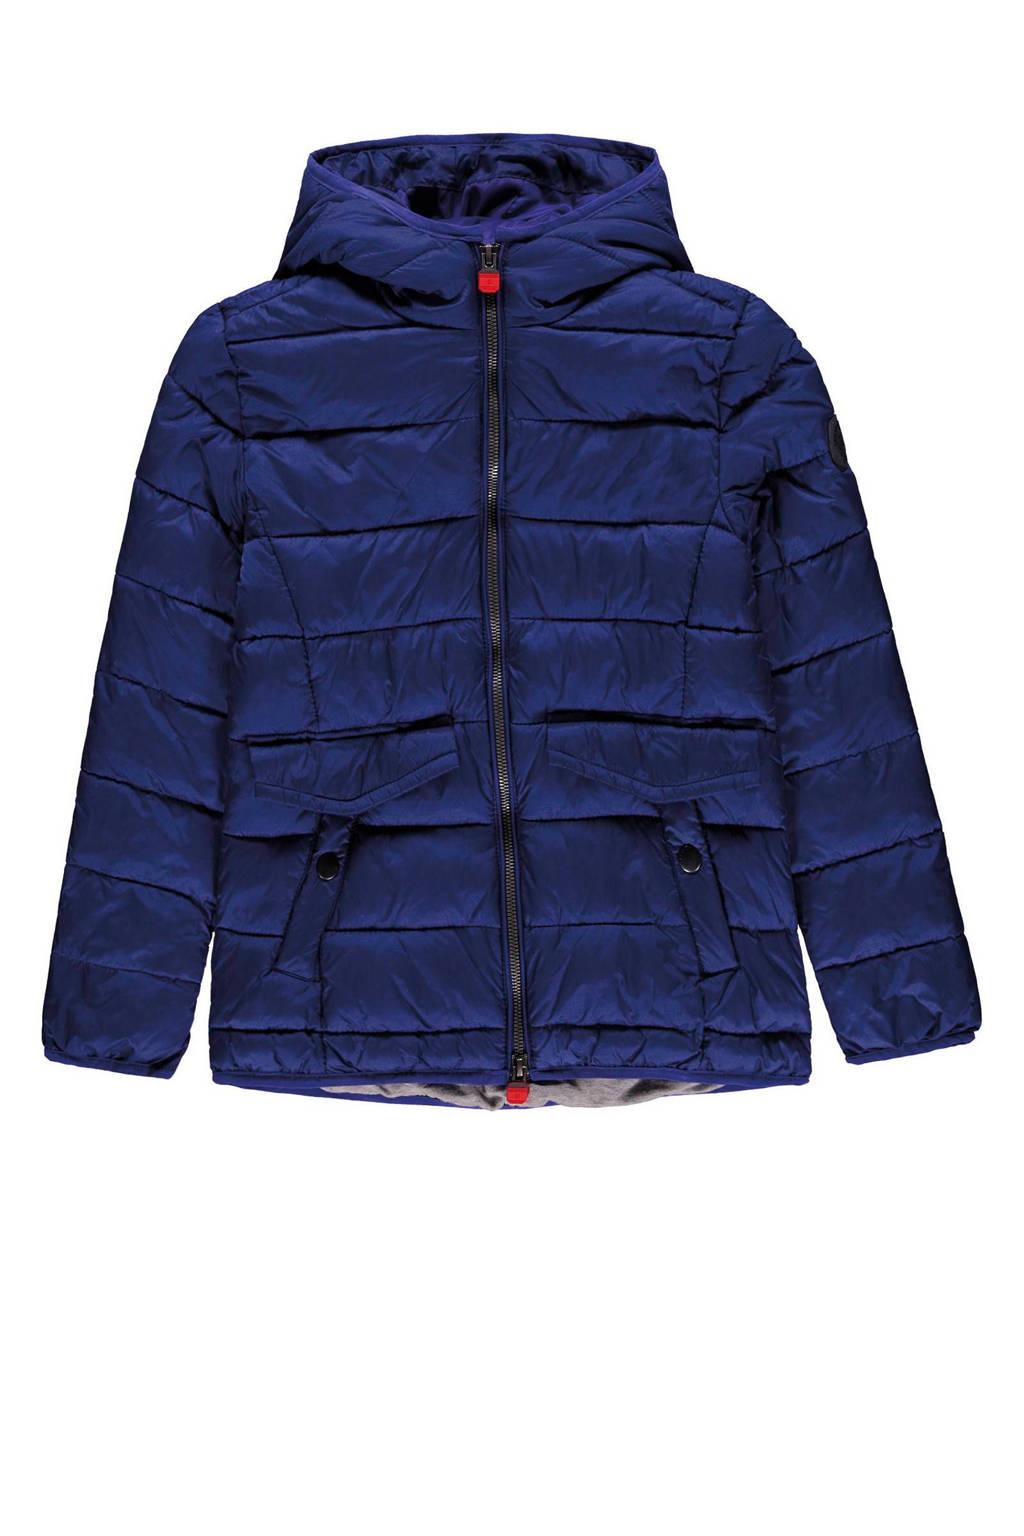 Marc O'Polo jas met stiksels blauw, Blauw